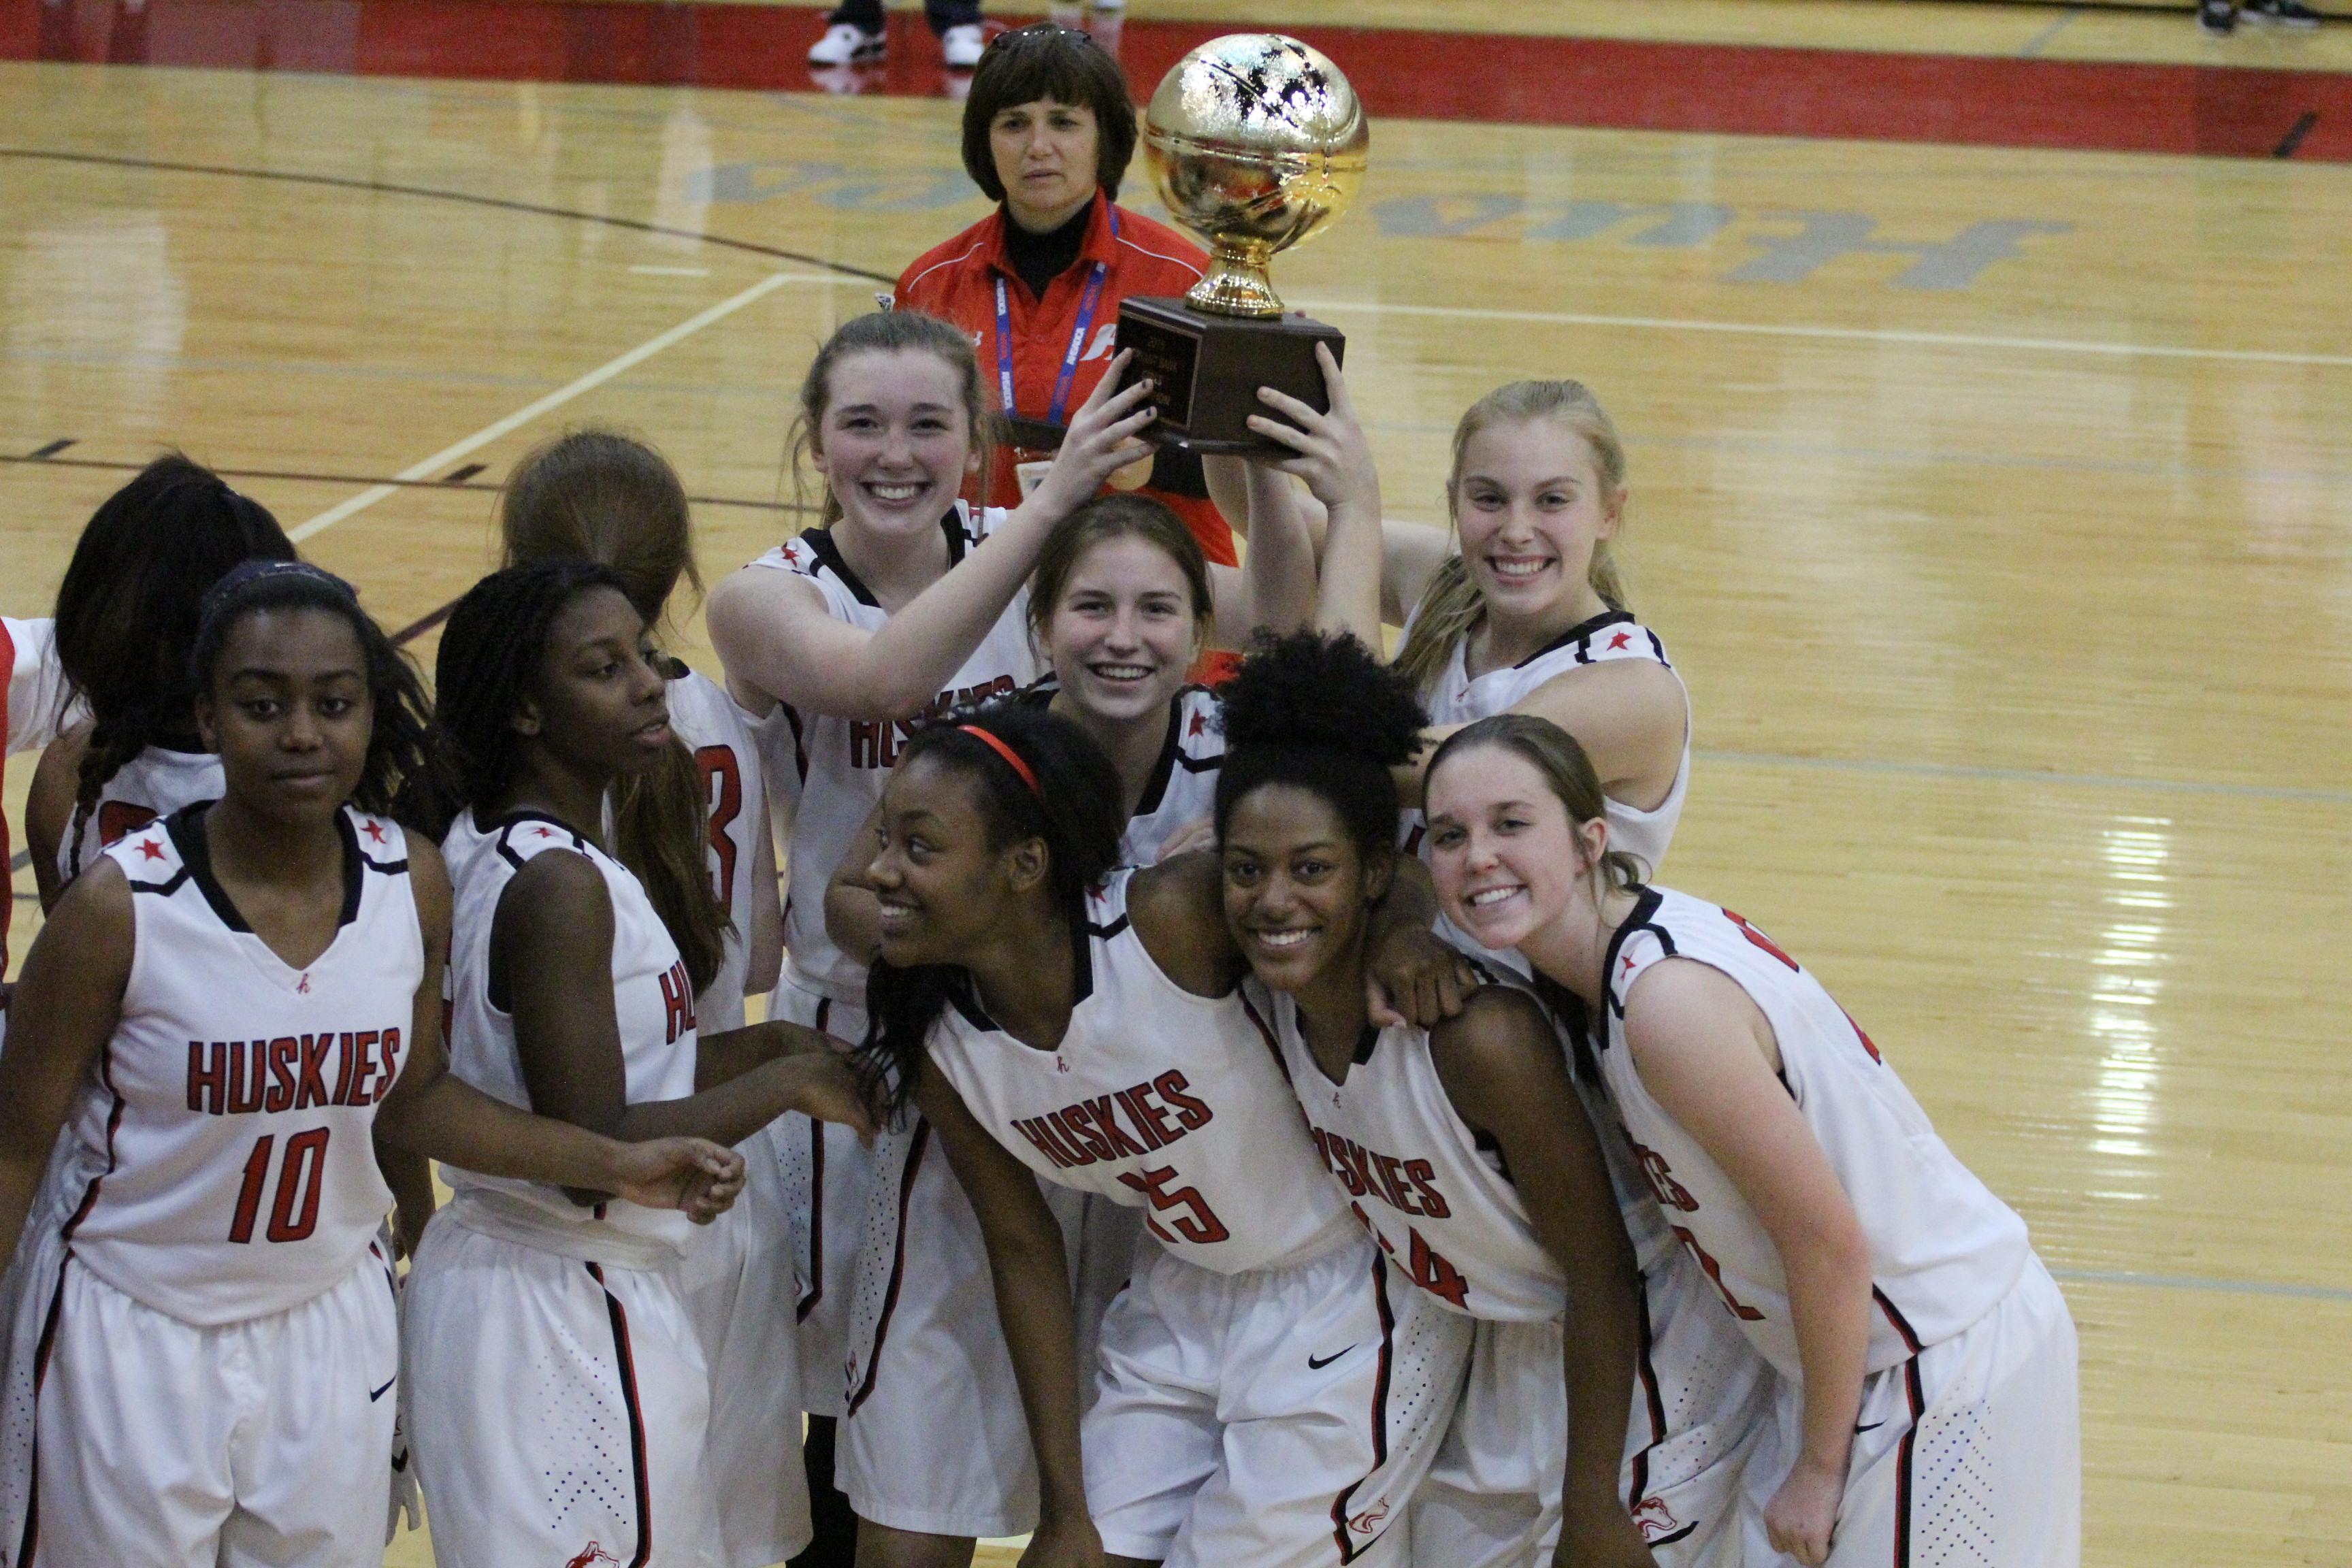 Hewitt-Trussville girls take Thanksgiving tourney championship